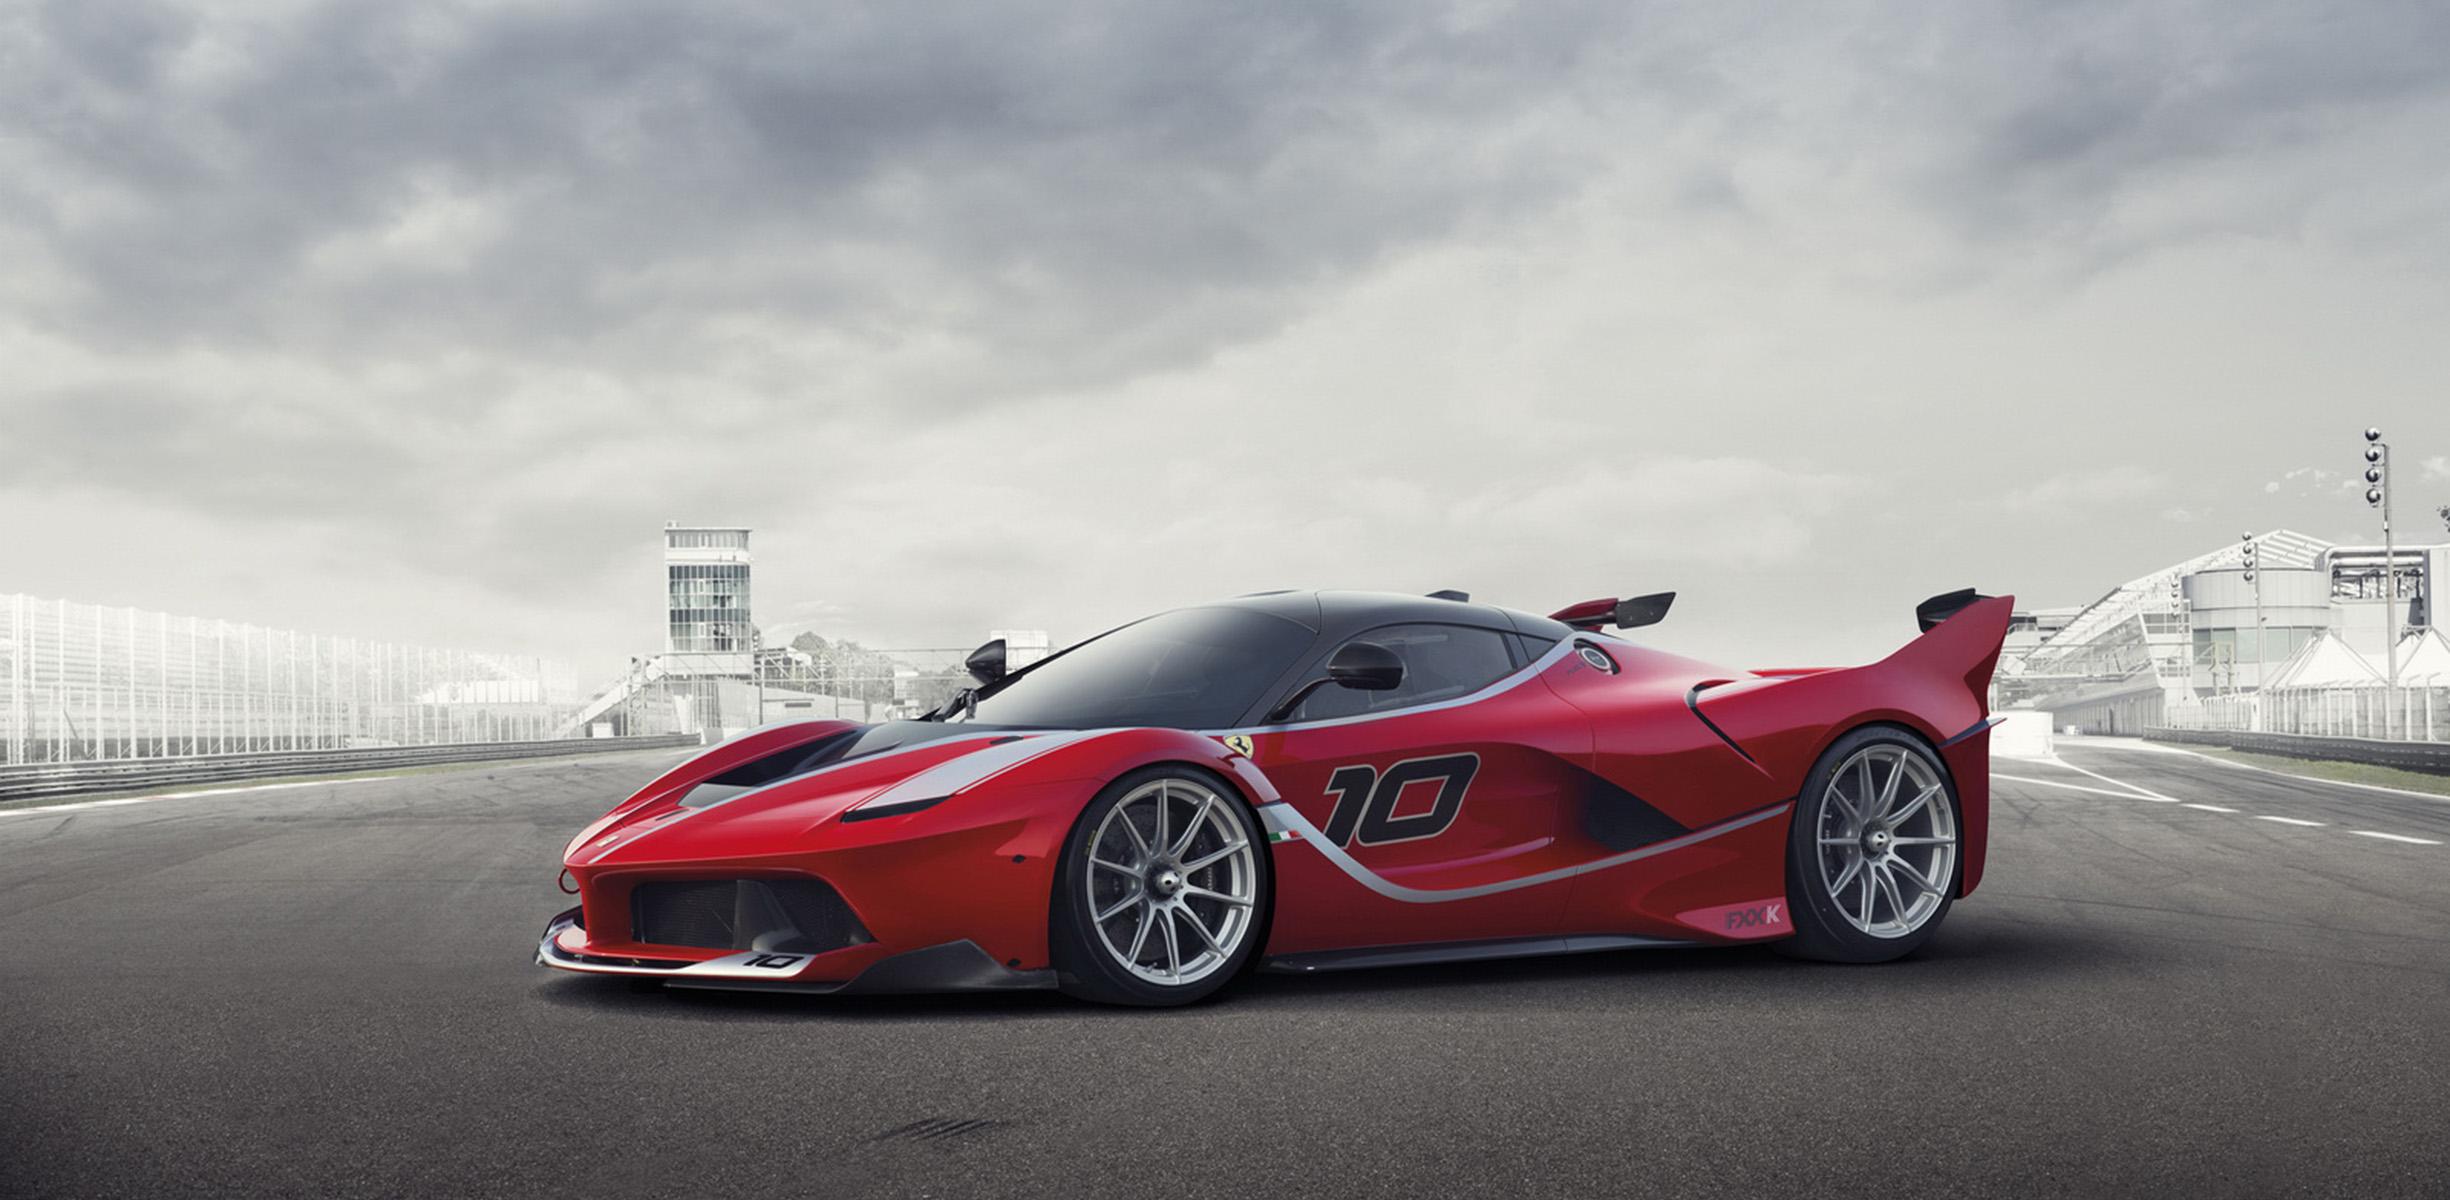 Ferrari Fxx K 772kw Track Only Version Of The Hybrid